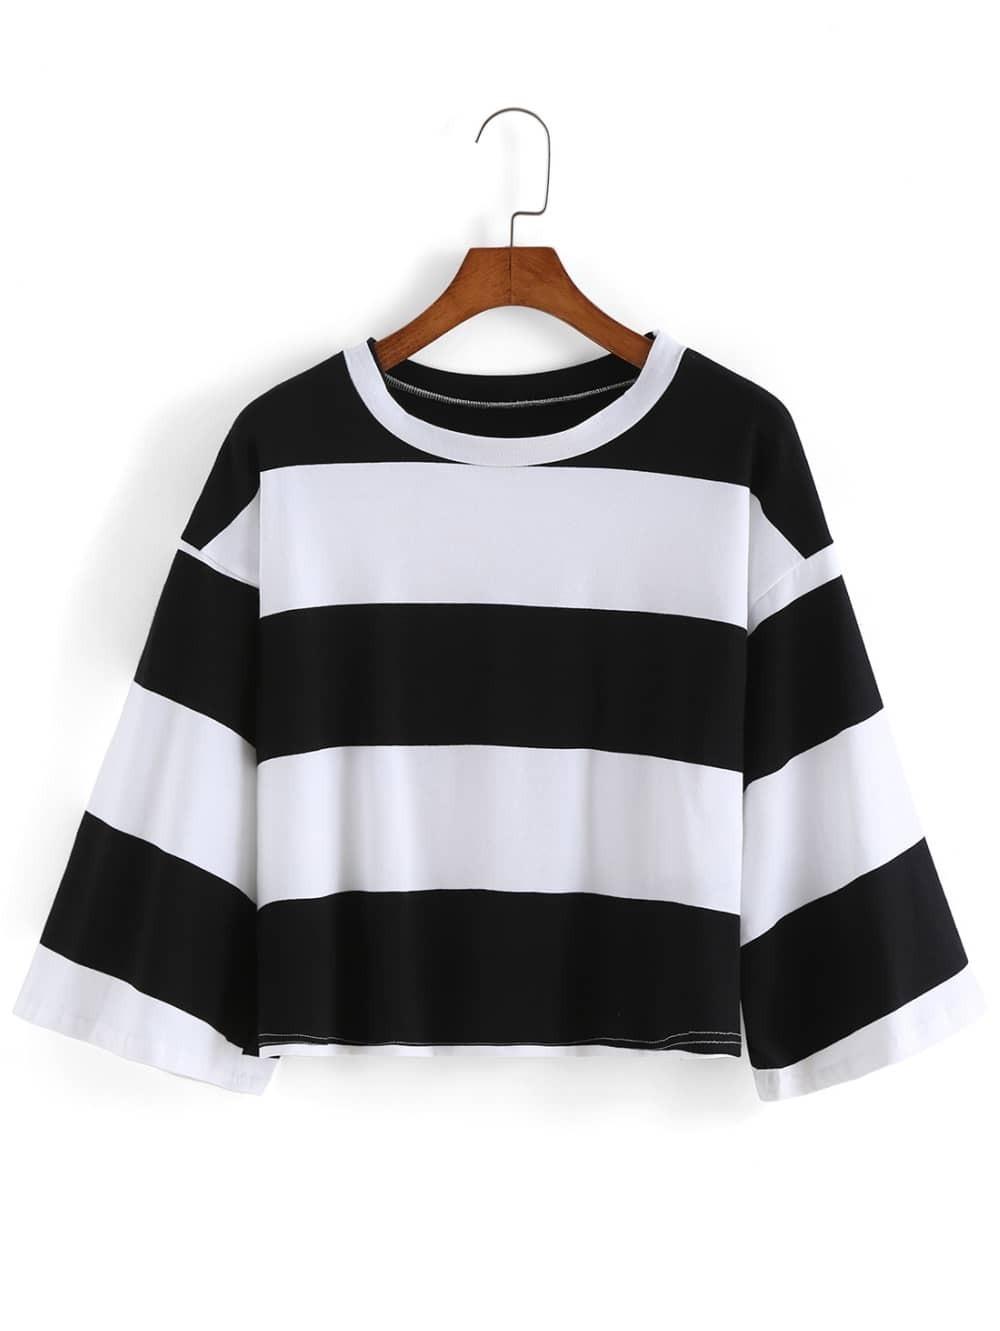 Bell sleeve striped crop black t shirtfor women romwe for Bell bottom sleeve shirt